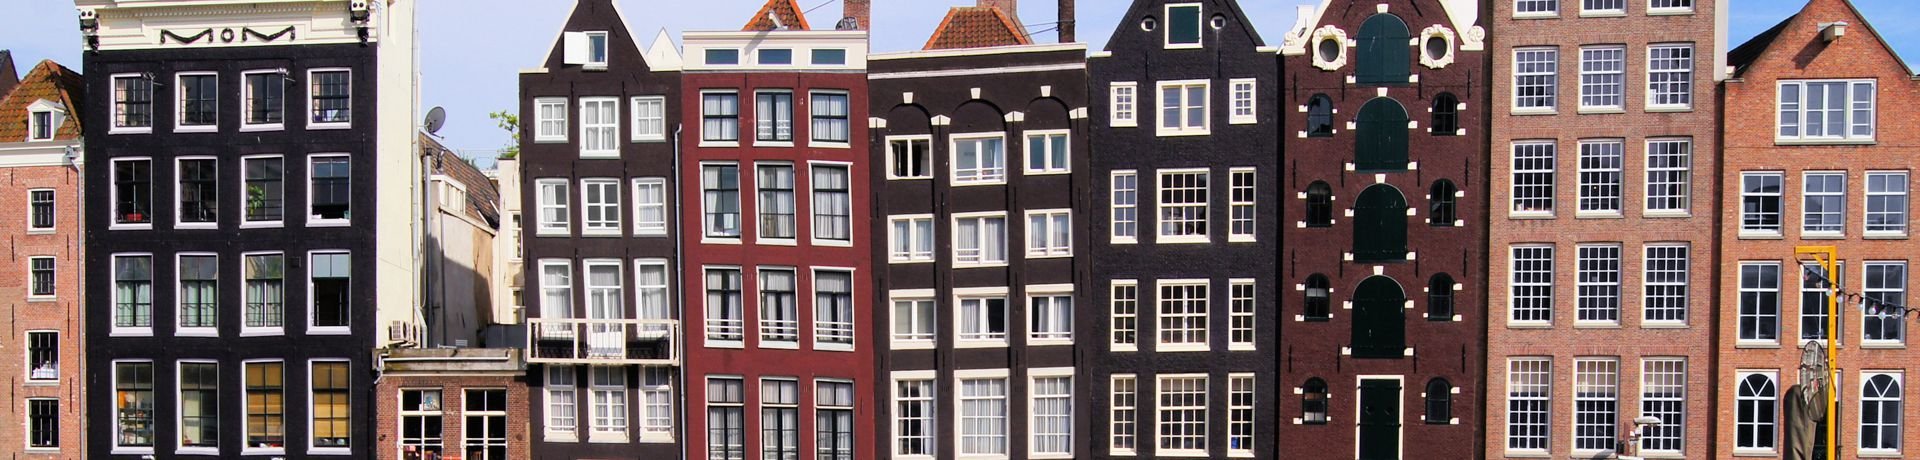 Supertrips - Amsterdam